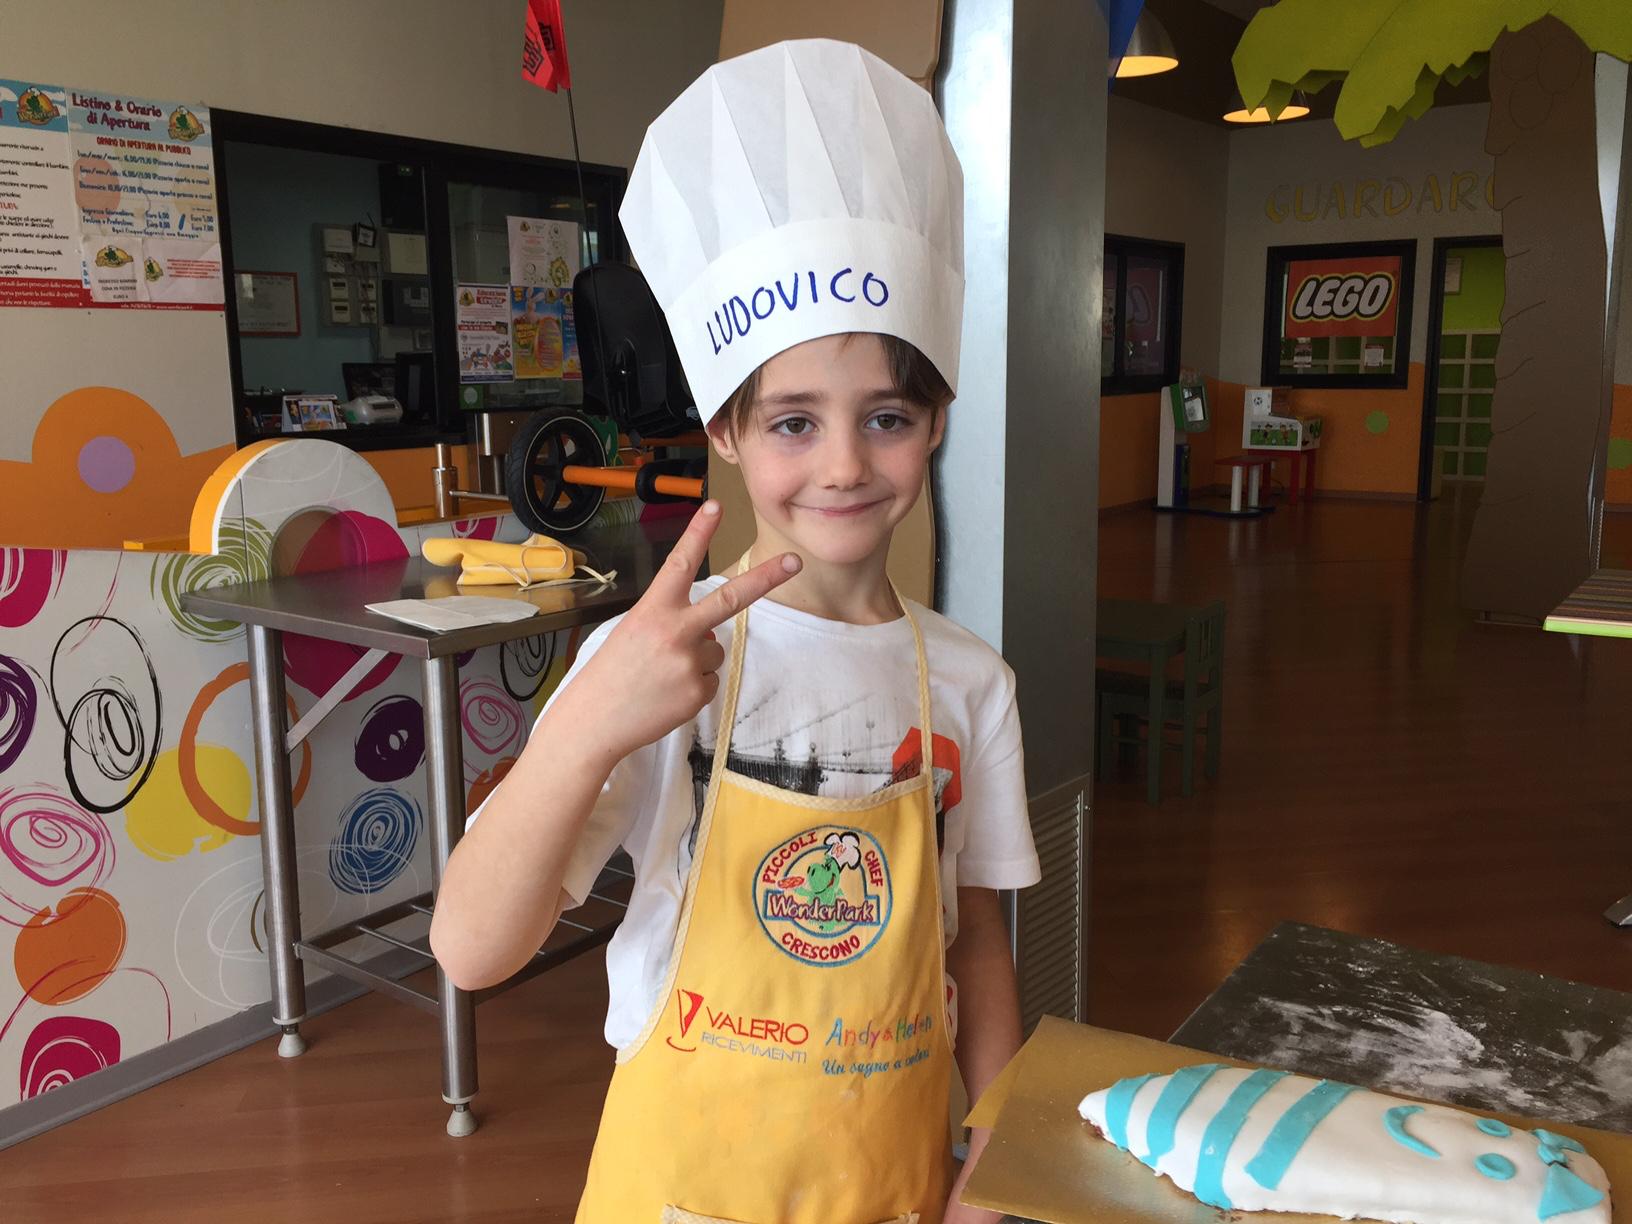 Wonderful!! Anzi WonderPark! Lezioni di cucina per bambini